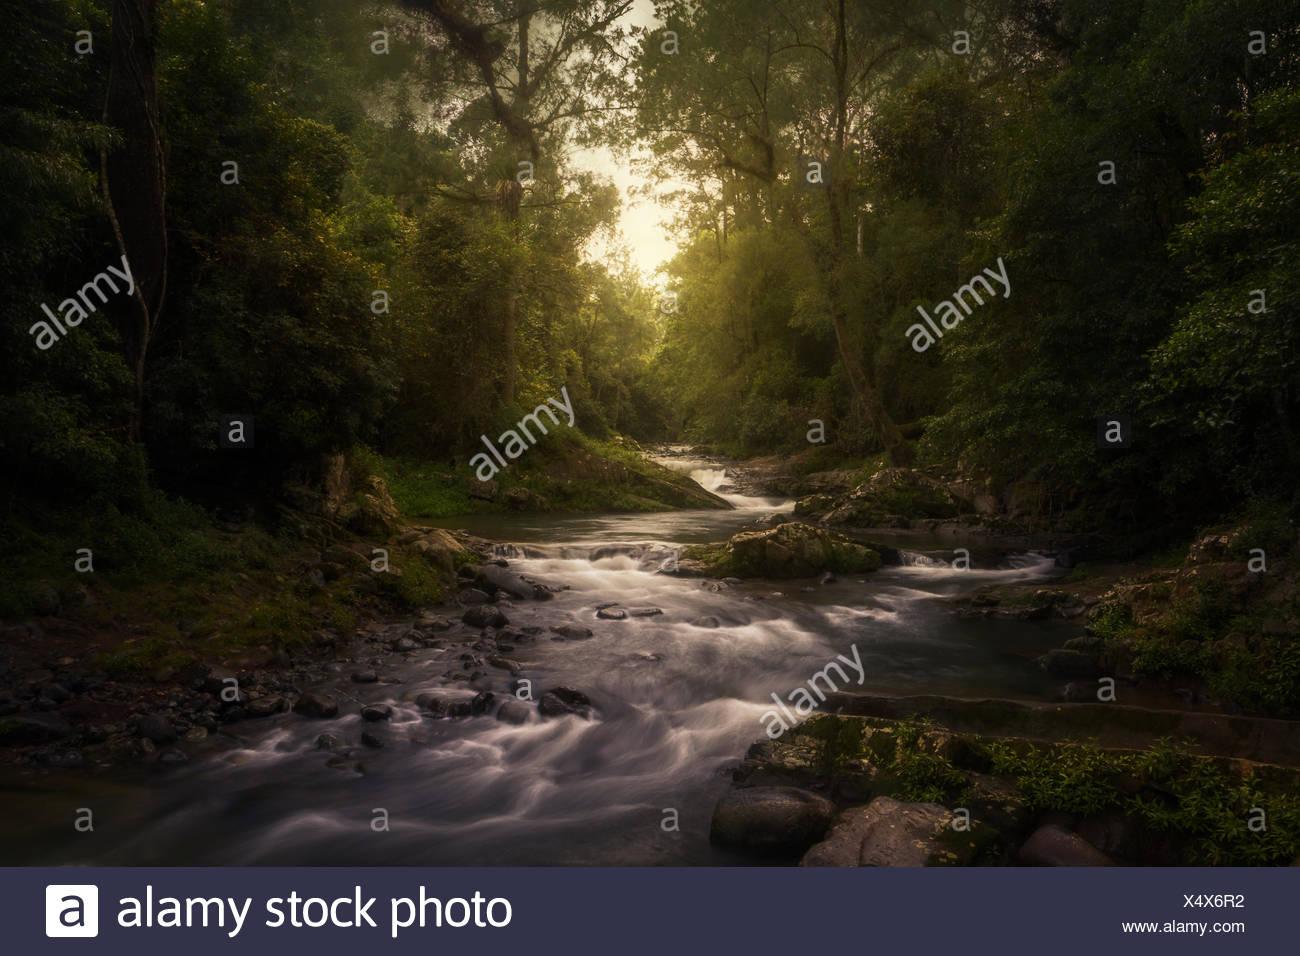 Stream in rainforest, Barrington Tops, New South Wales, Australia - Stock Image